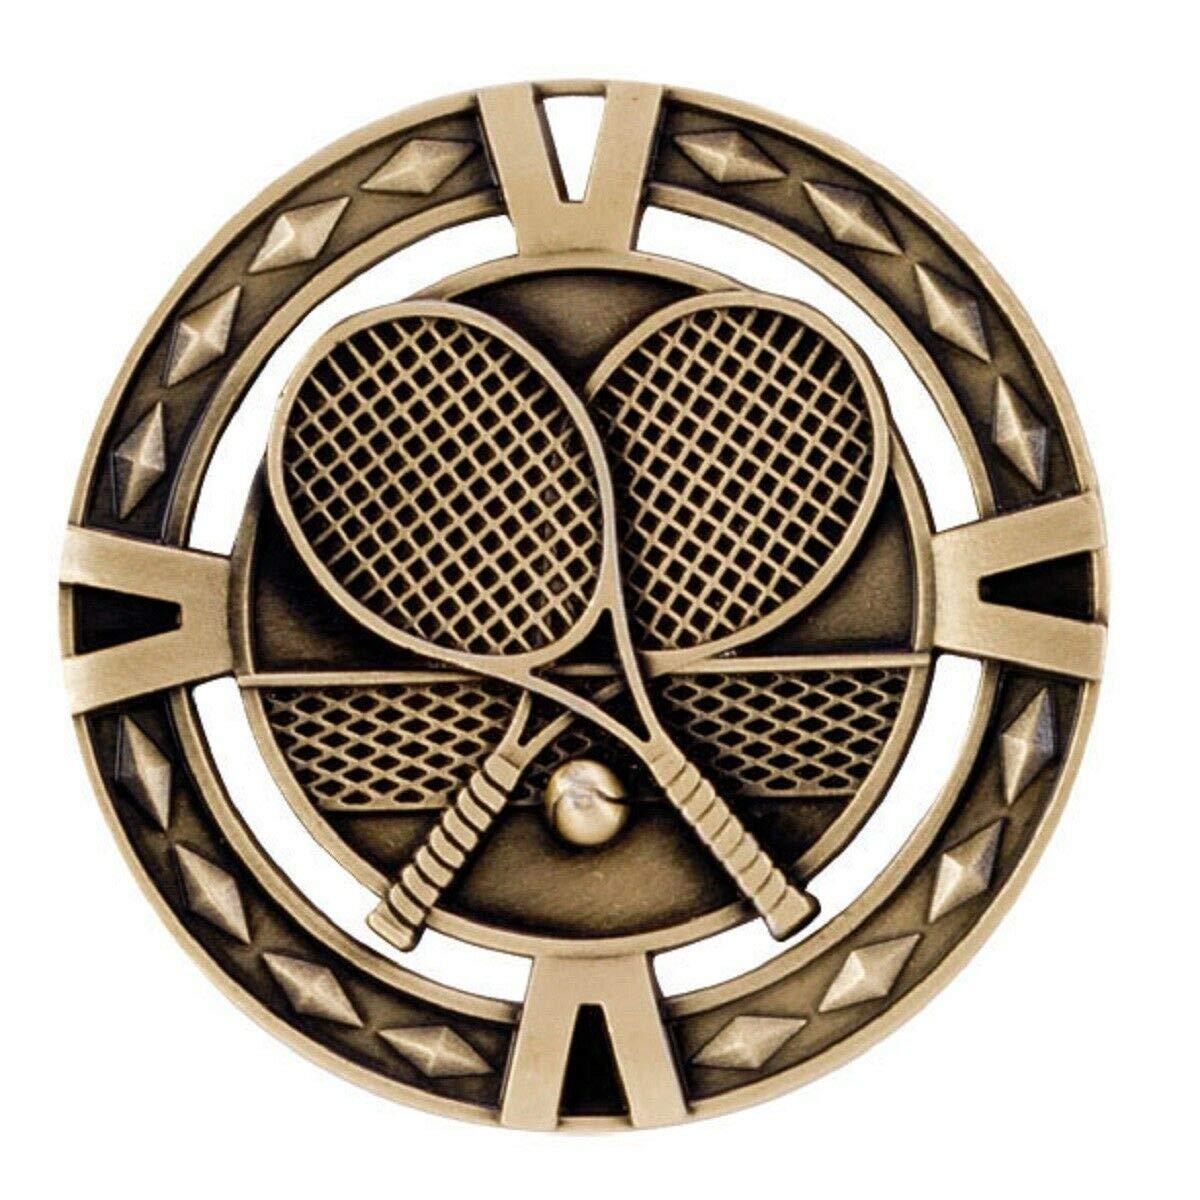 Gold V-Tech Tennis Medal Ribbon Choice C4 Personalised Engraved